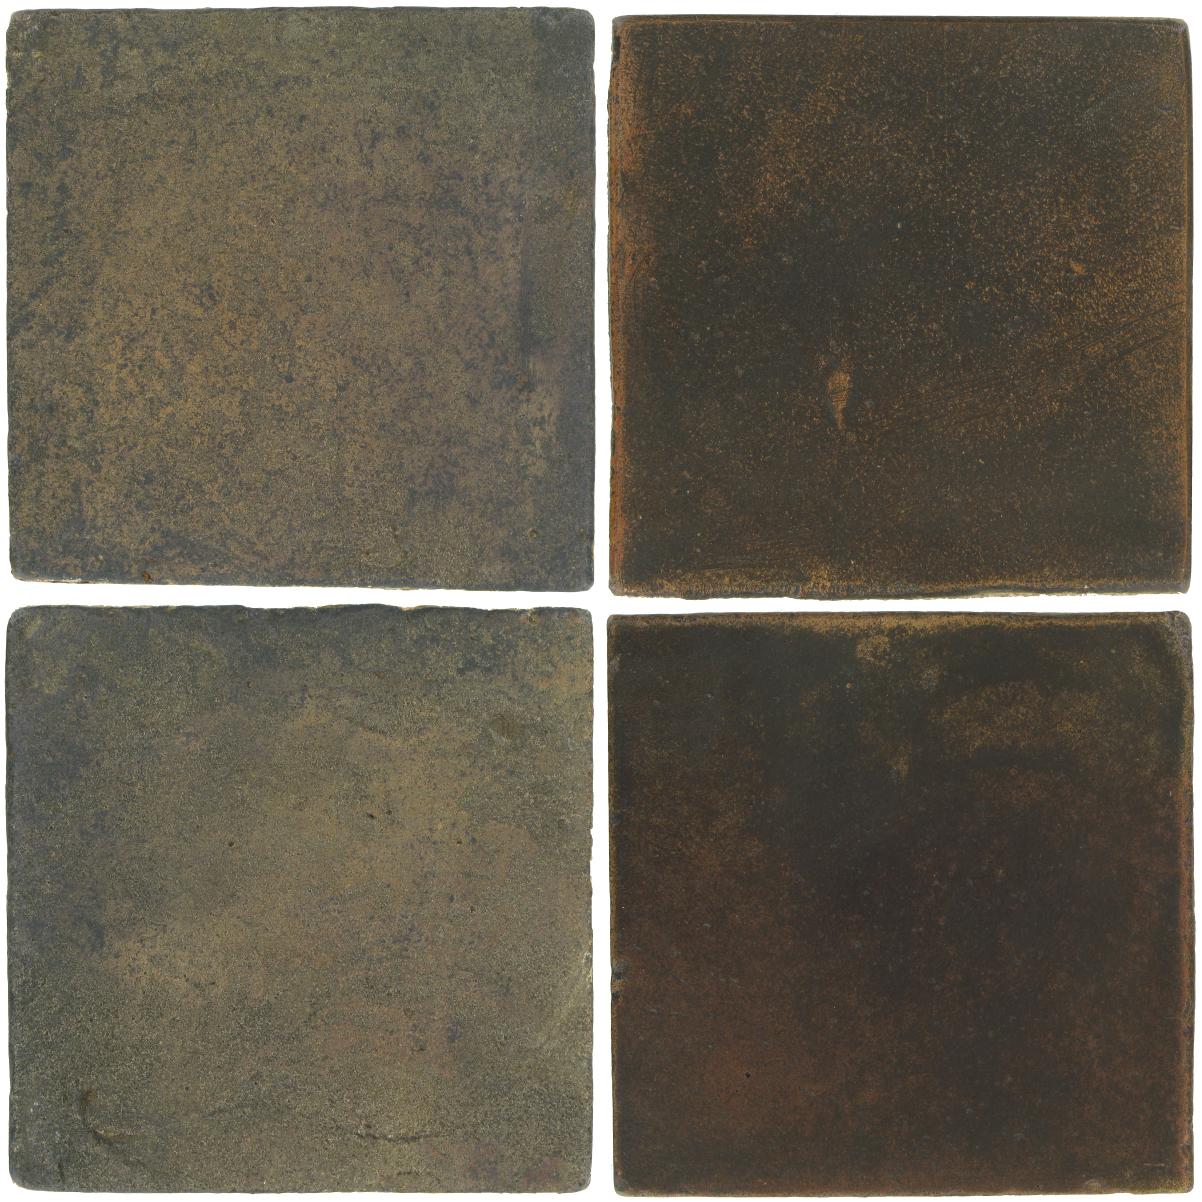 Pedralbes Antique Terracotta  2 Color Combinations  VTG-PSTG Terra Grey + OHS-PSCO Cologne Brown